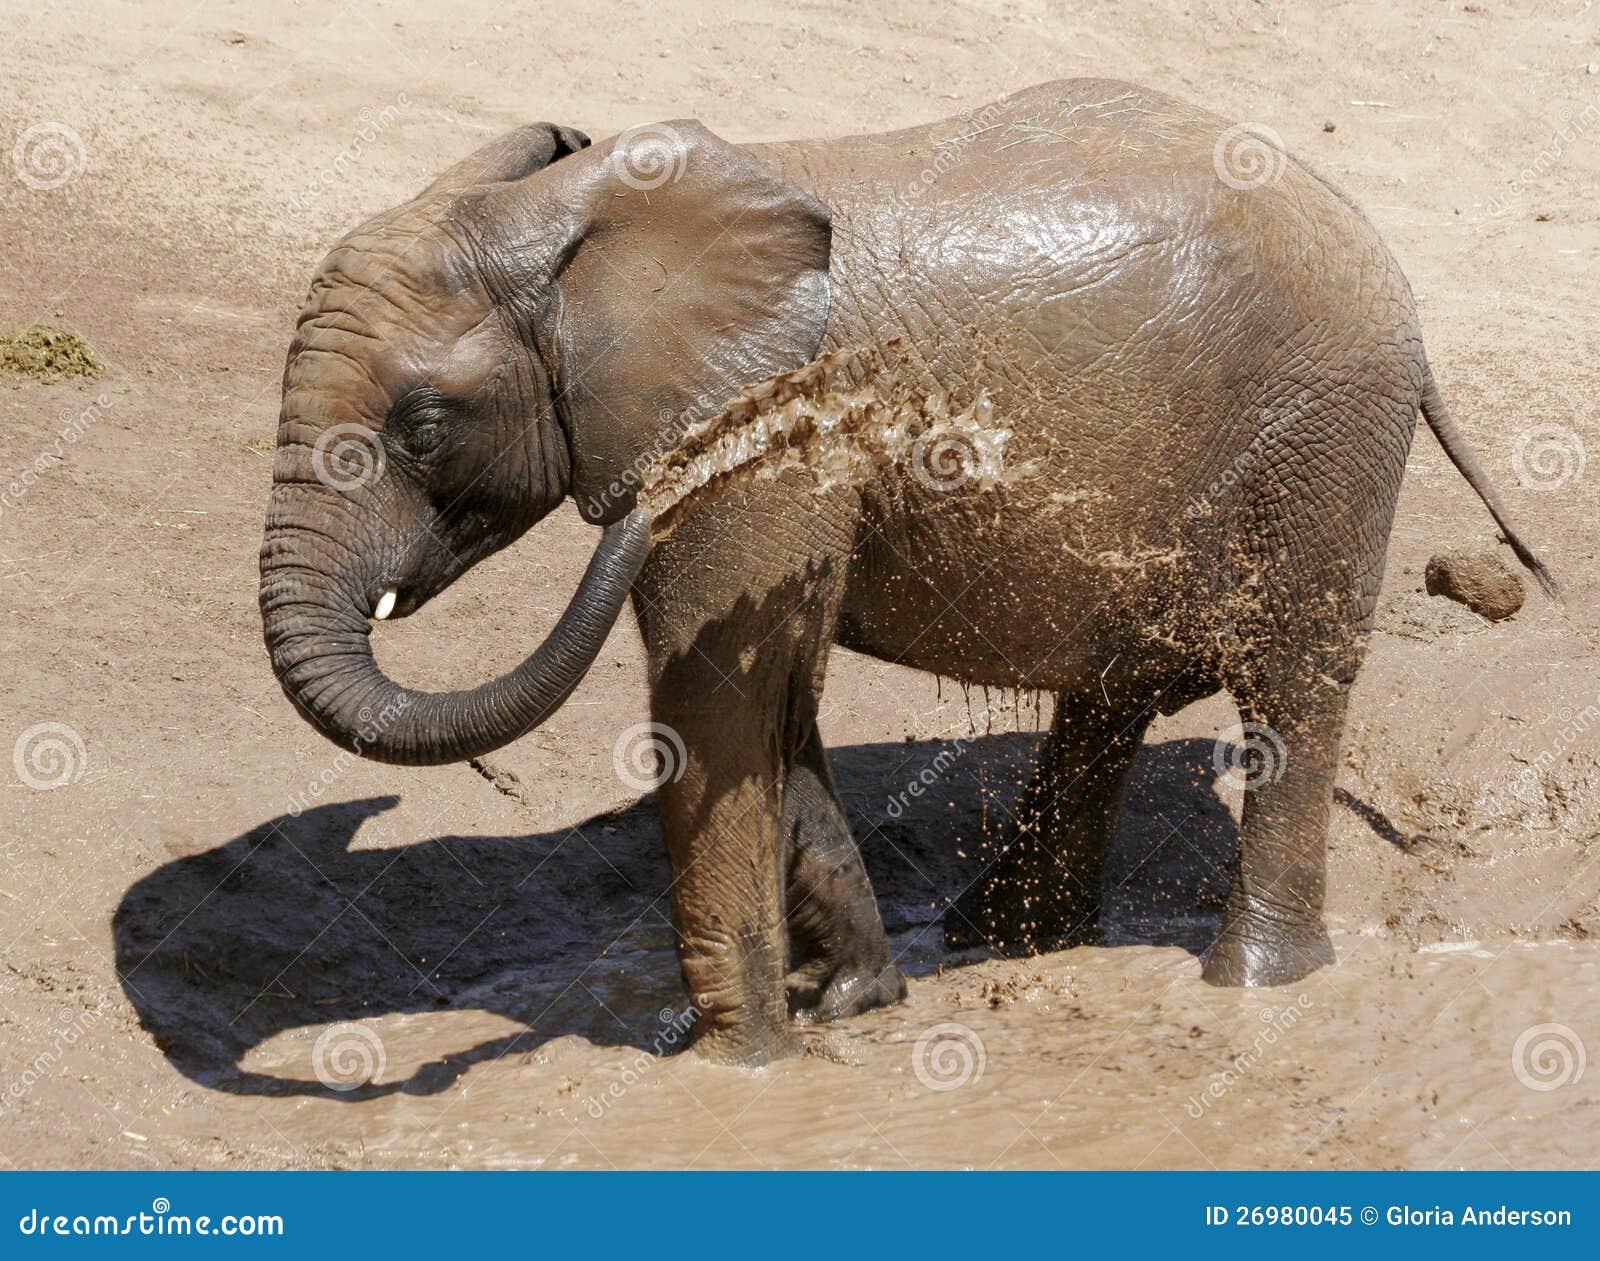 Elephant spraying water - photo#27